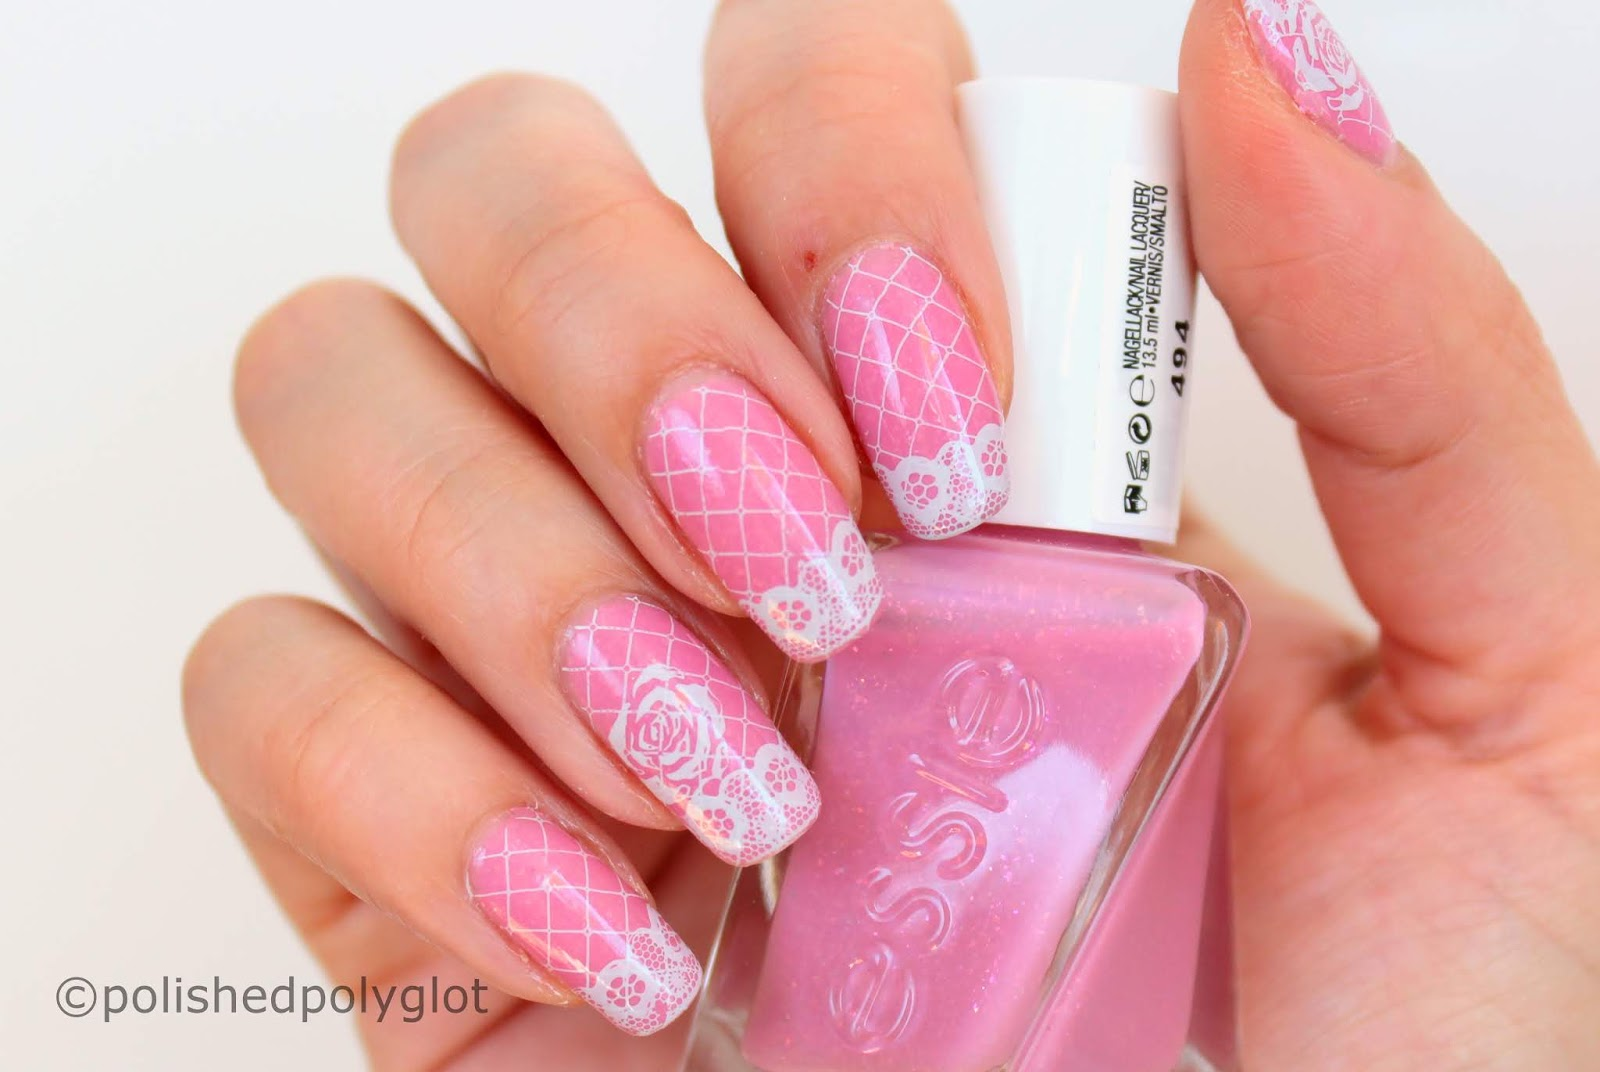 Nail Art │ Pink and Lace Wedding manicure [26 Great Nail Art Ideas ...